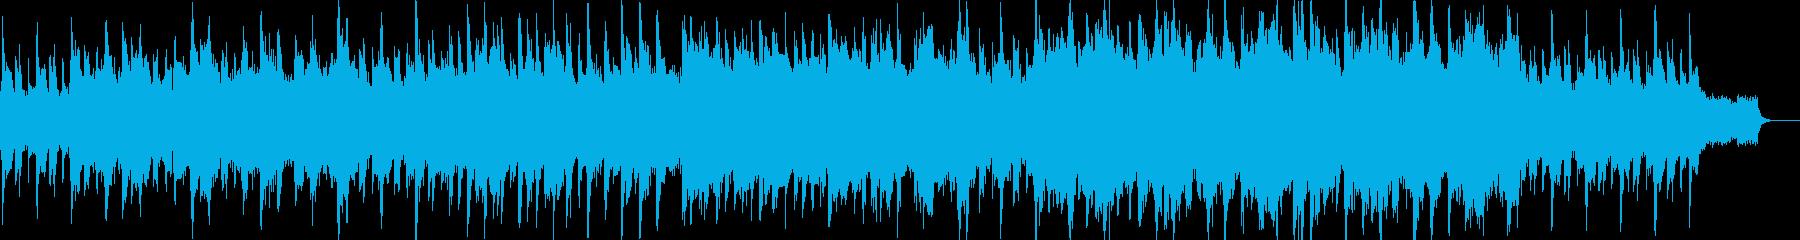 MOUNTAIN神々しく連なる山々の歌の再生済みの波形